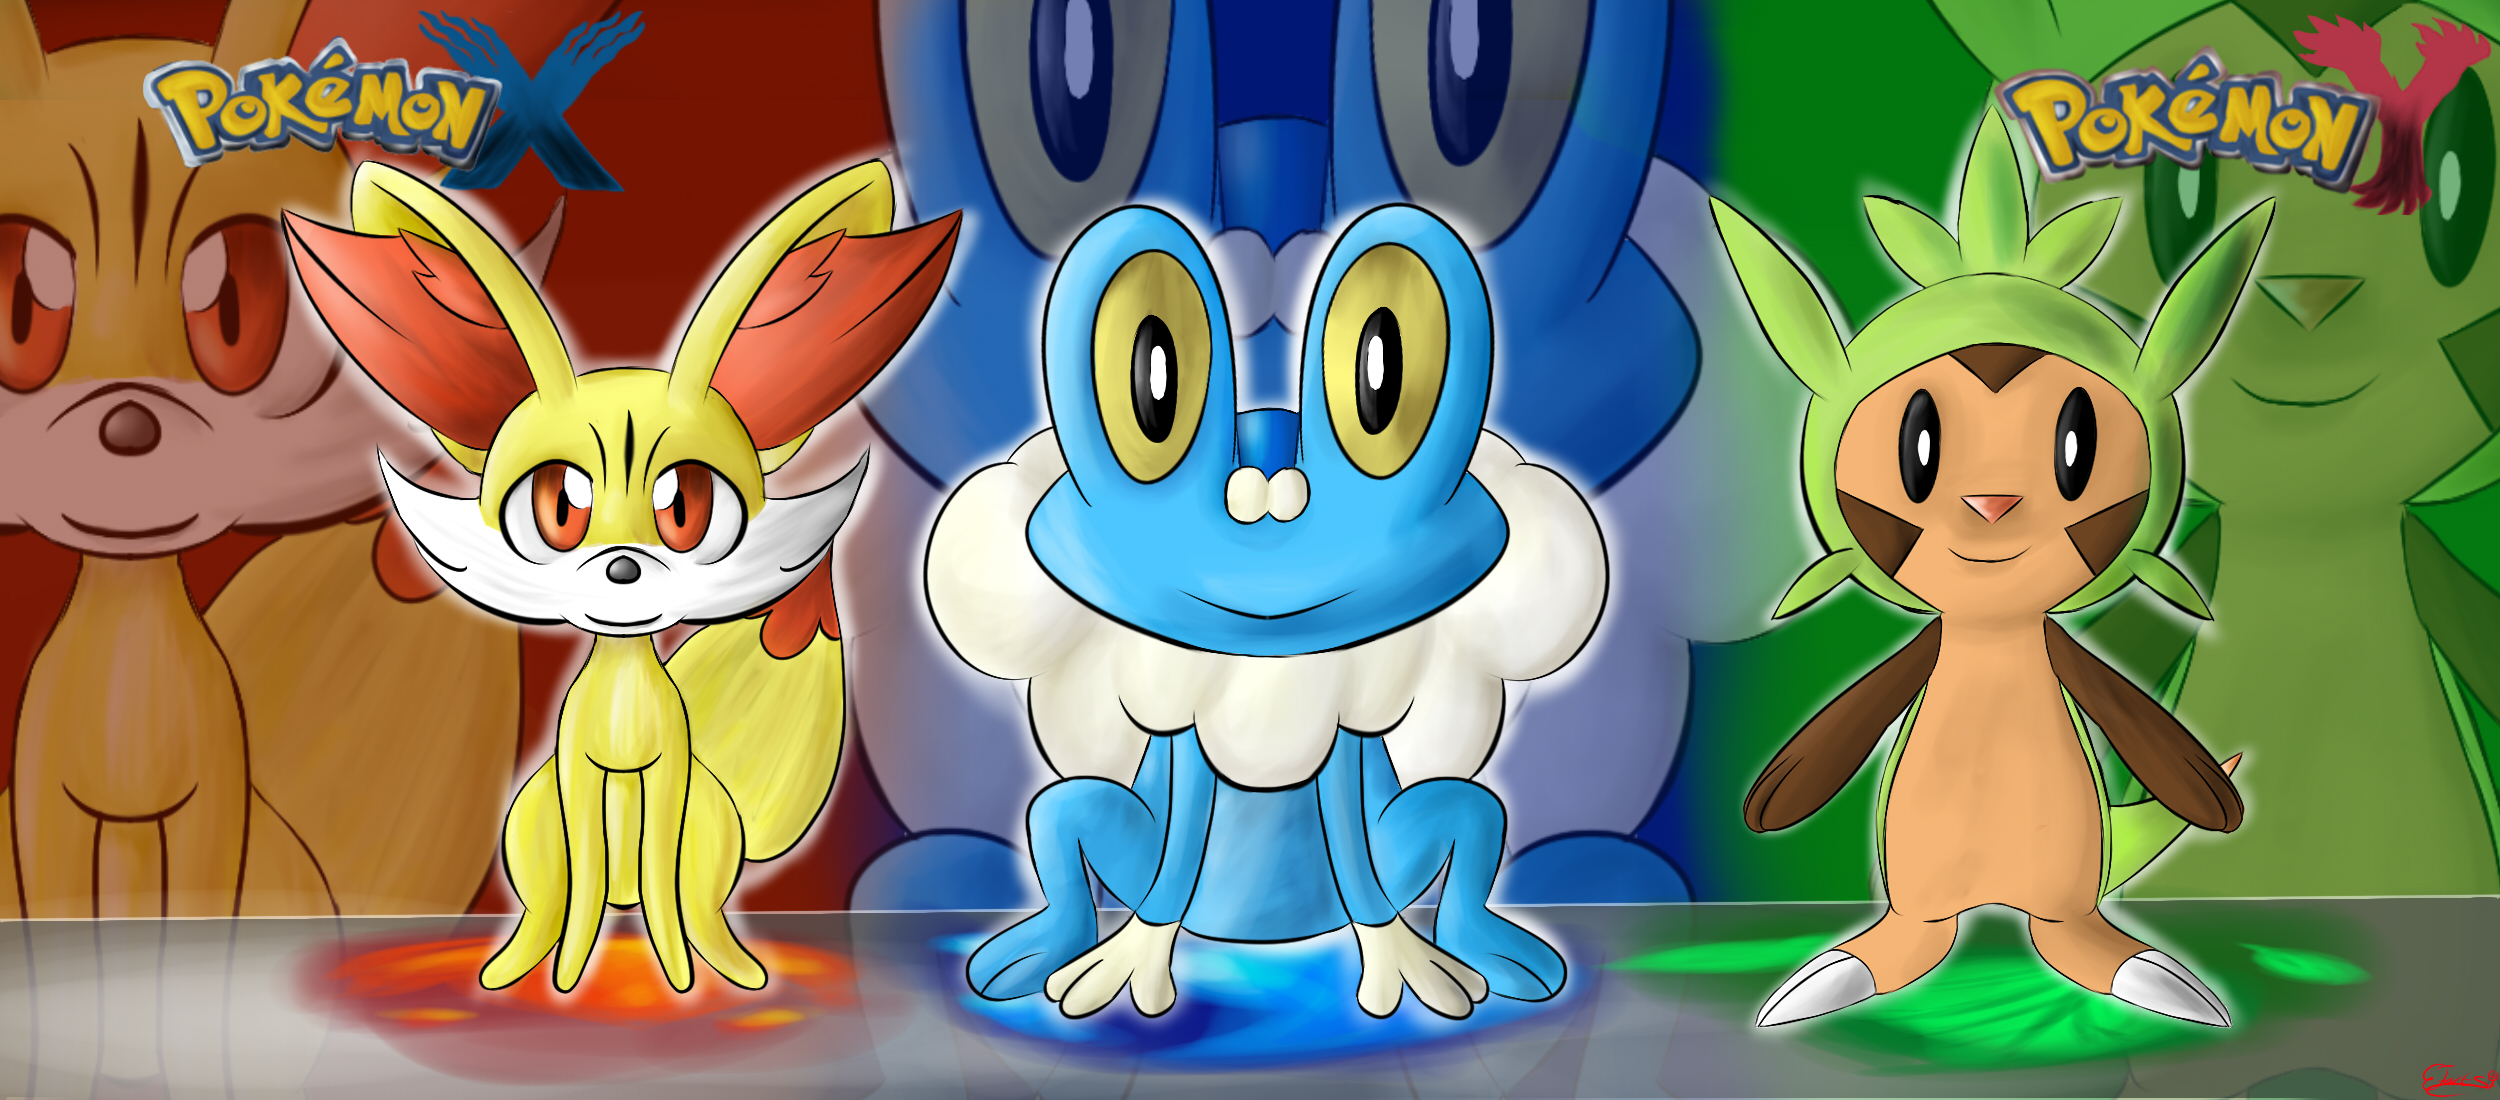 .: Pokemon X and Y starter pokemon :. by lifegiving